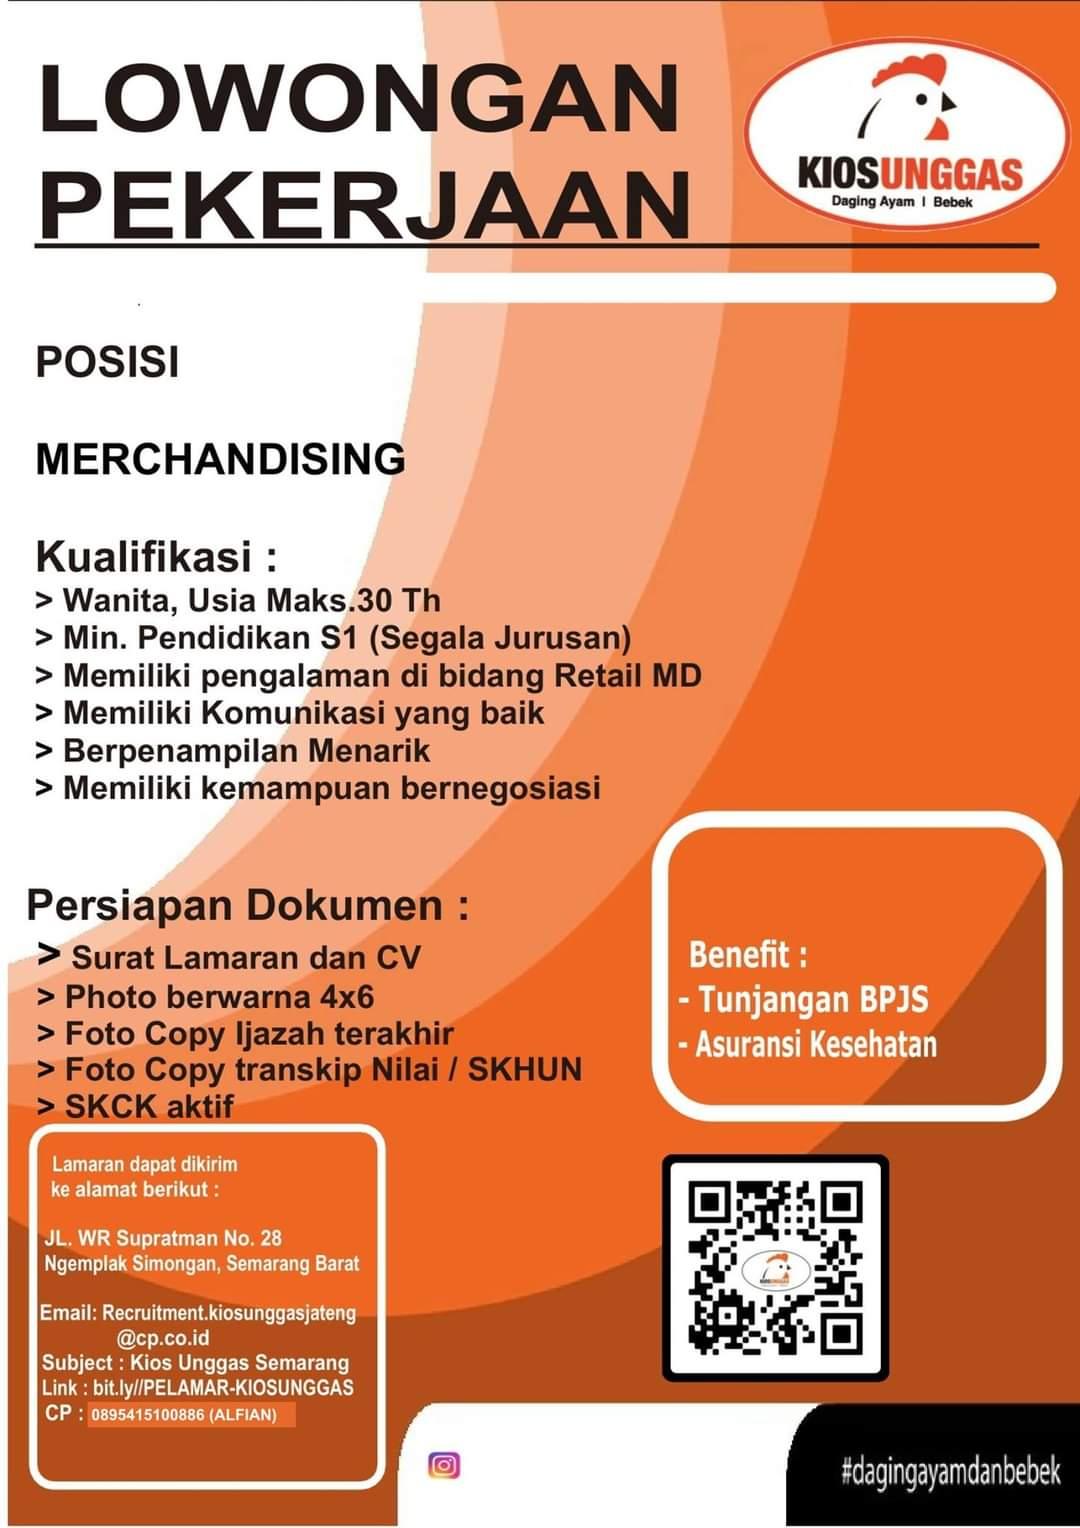 Lowongan Pekerjaan Posisi Merchanfising di Kios Unggas Semarang Barat